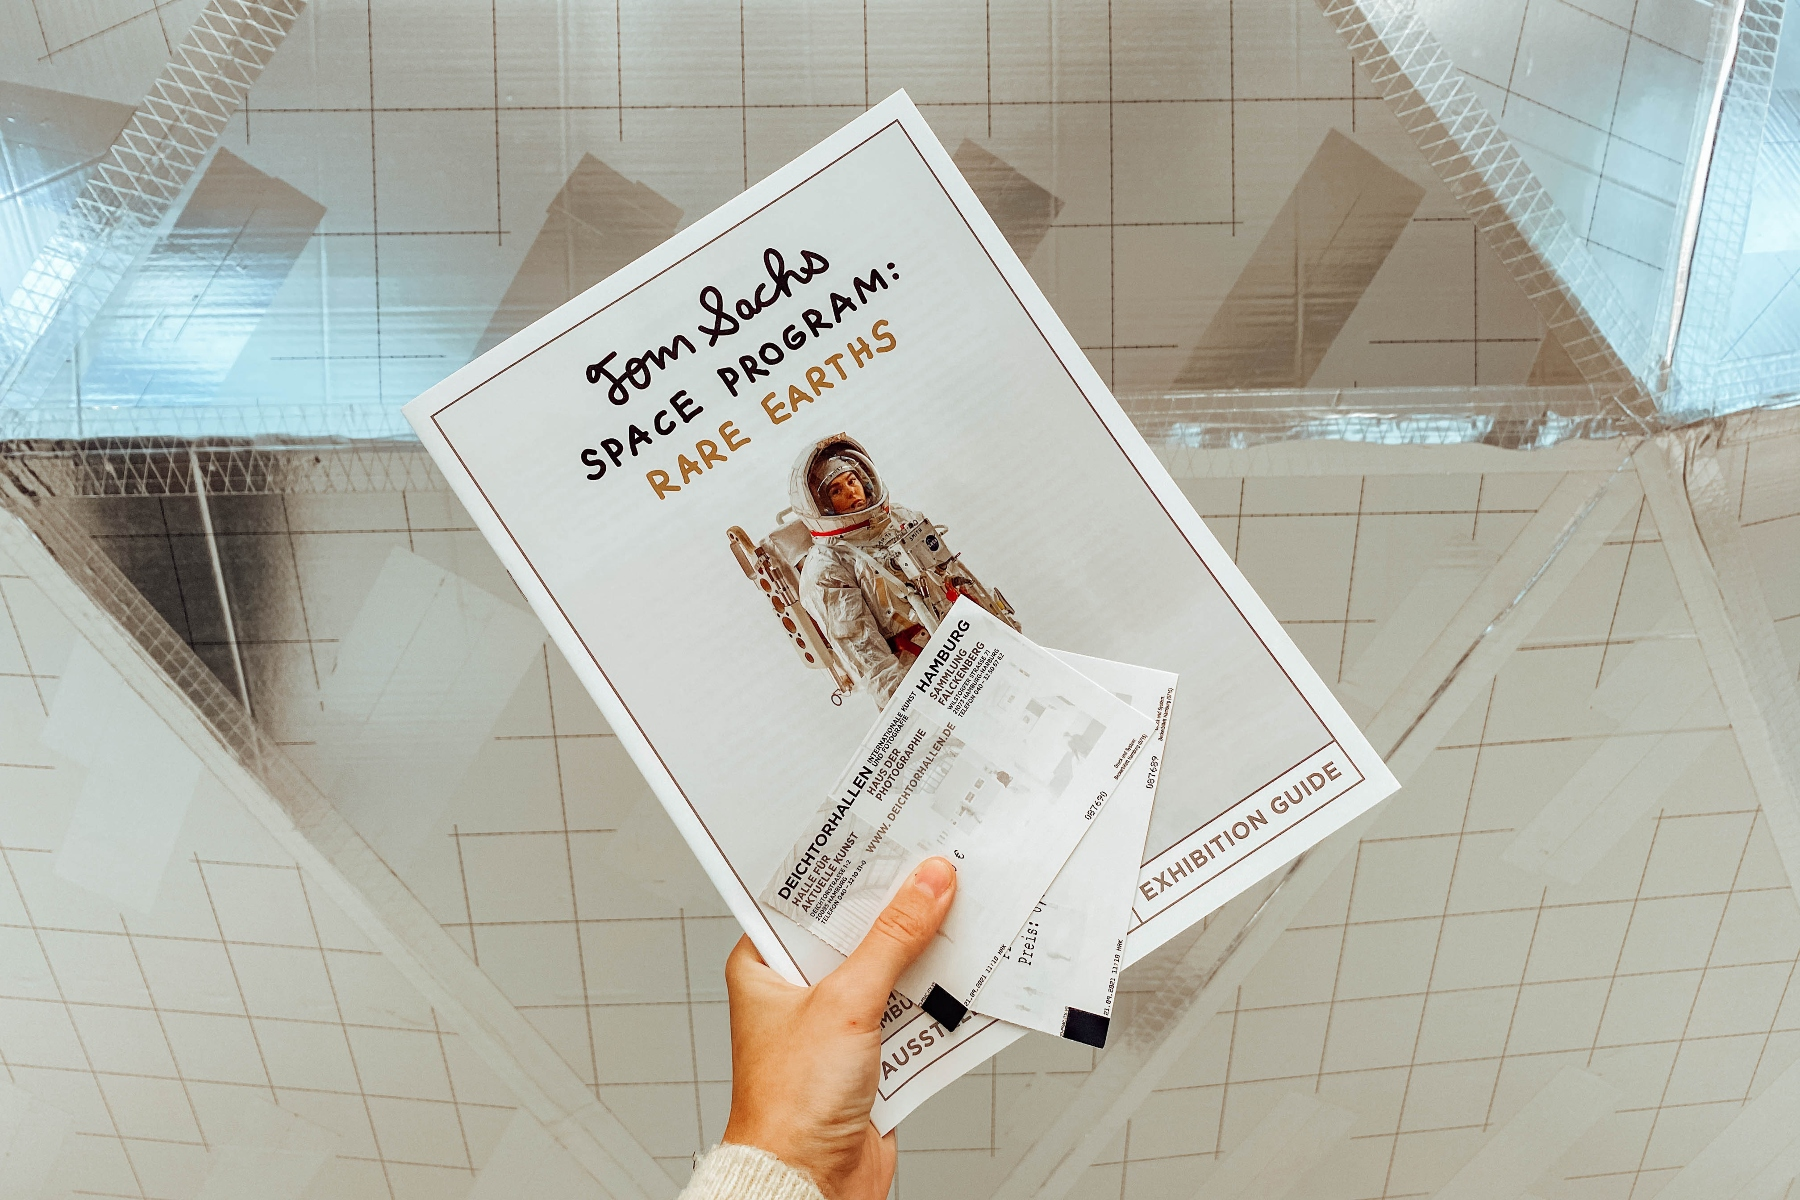 Geheimtipp Hamburg Kunst & Kultur Ausstellung Tom Sachs Space Program Lilli Sprung Sophie Stögmüller 14